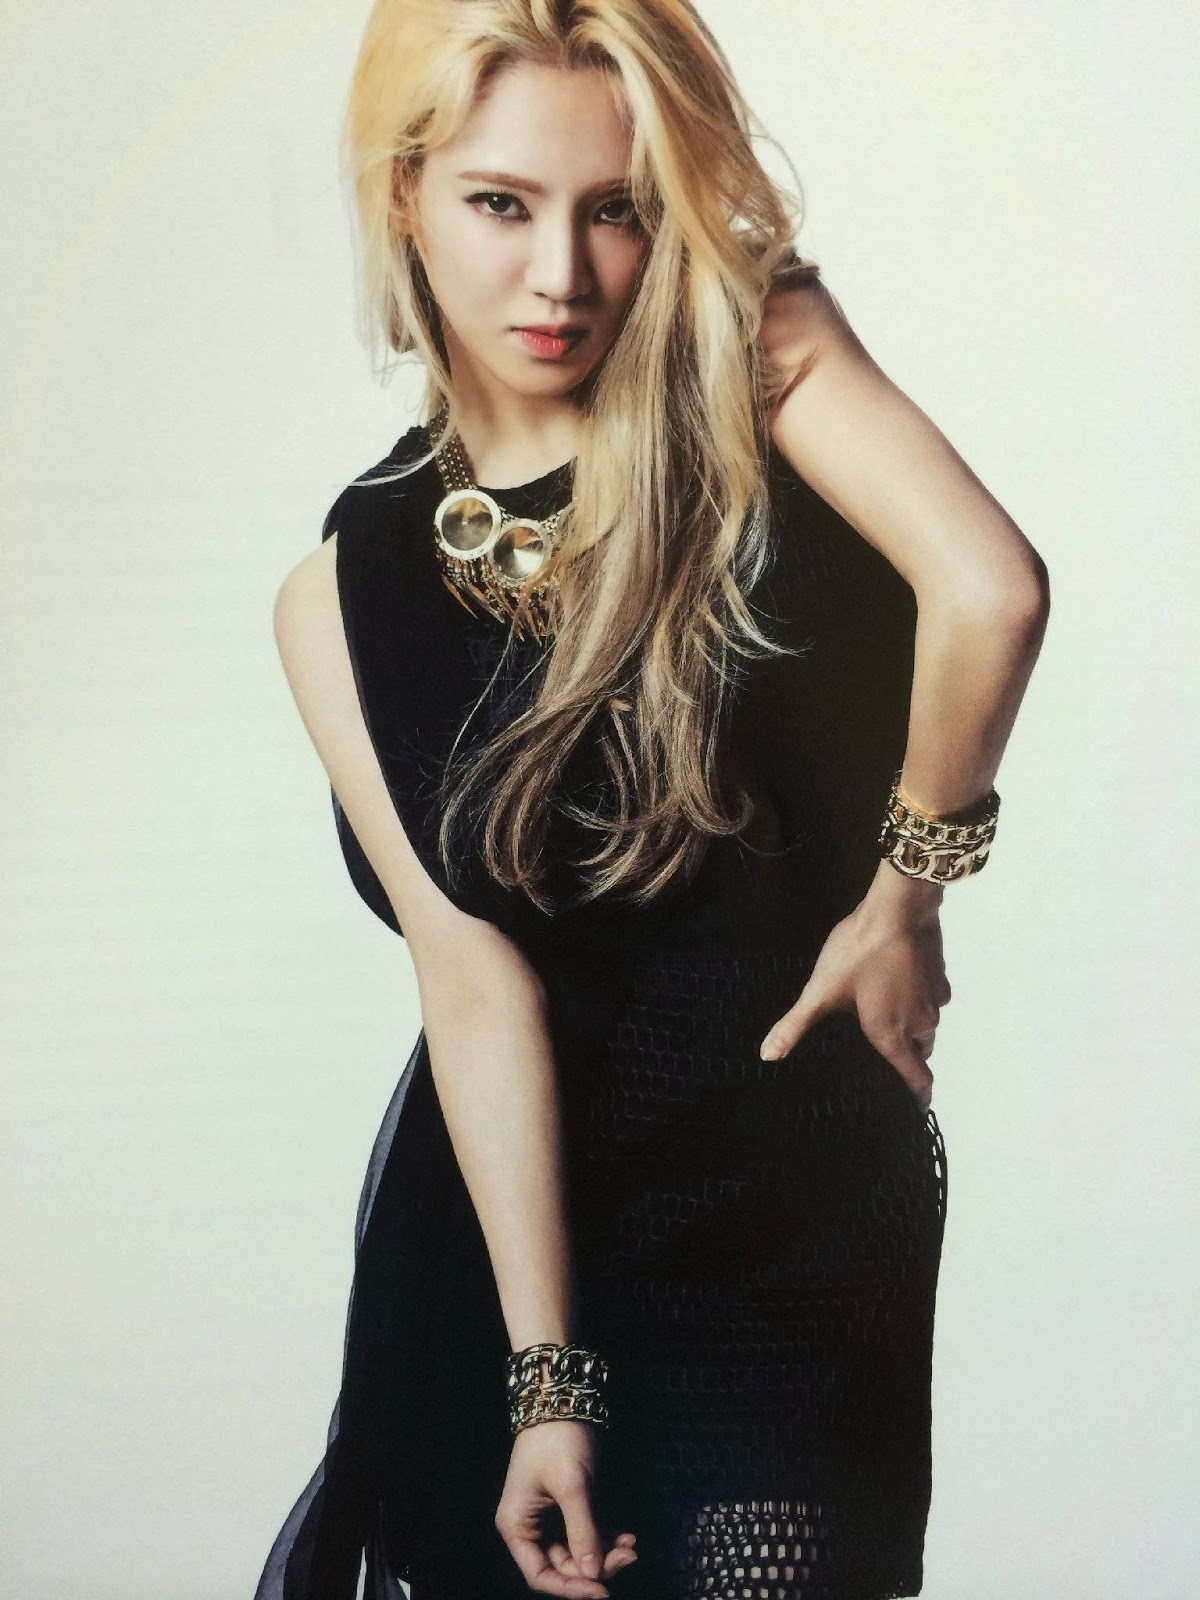 SNSD Hyoyeon (효연; ヒョヨン) Girls Generation The Best Scan Photos 2